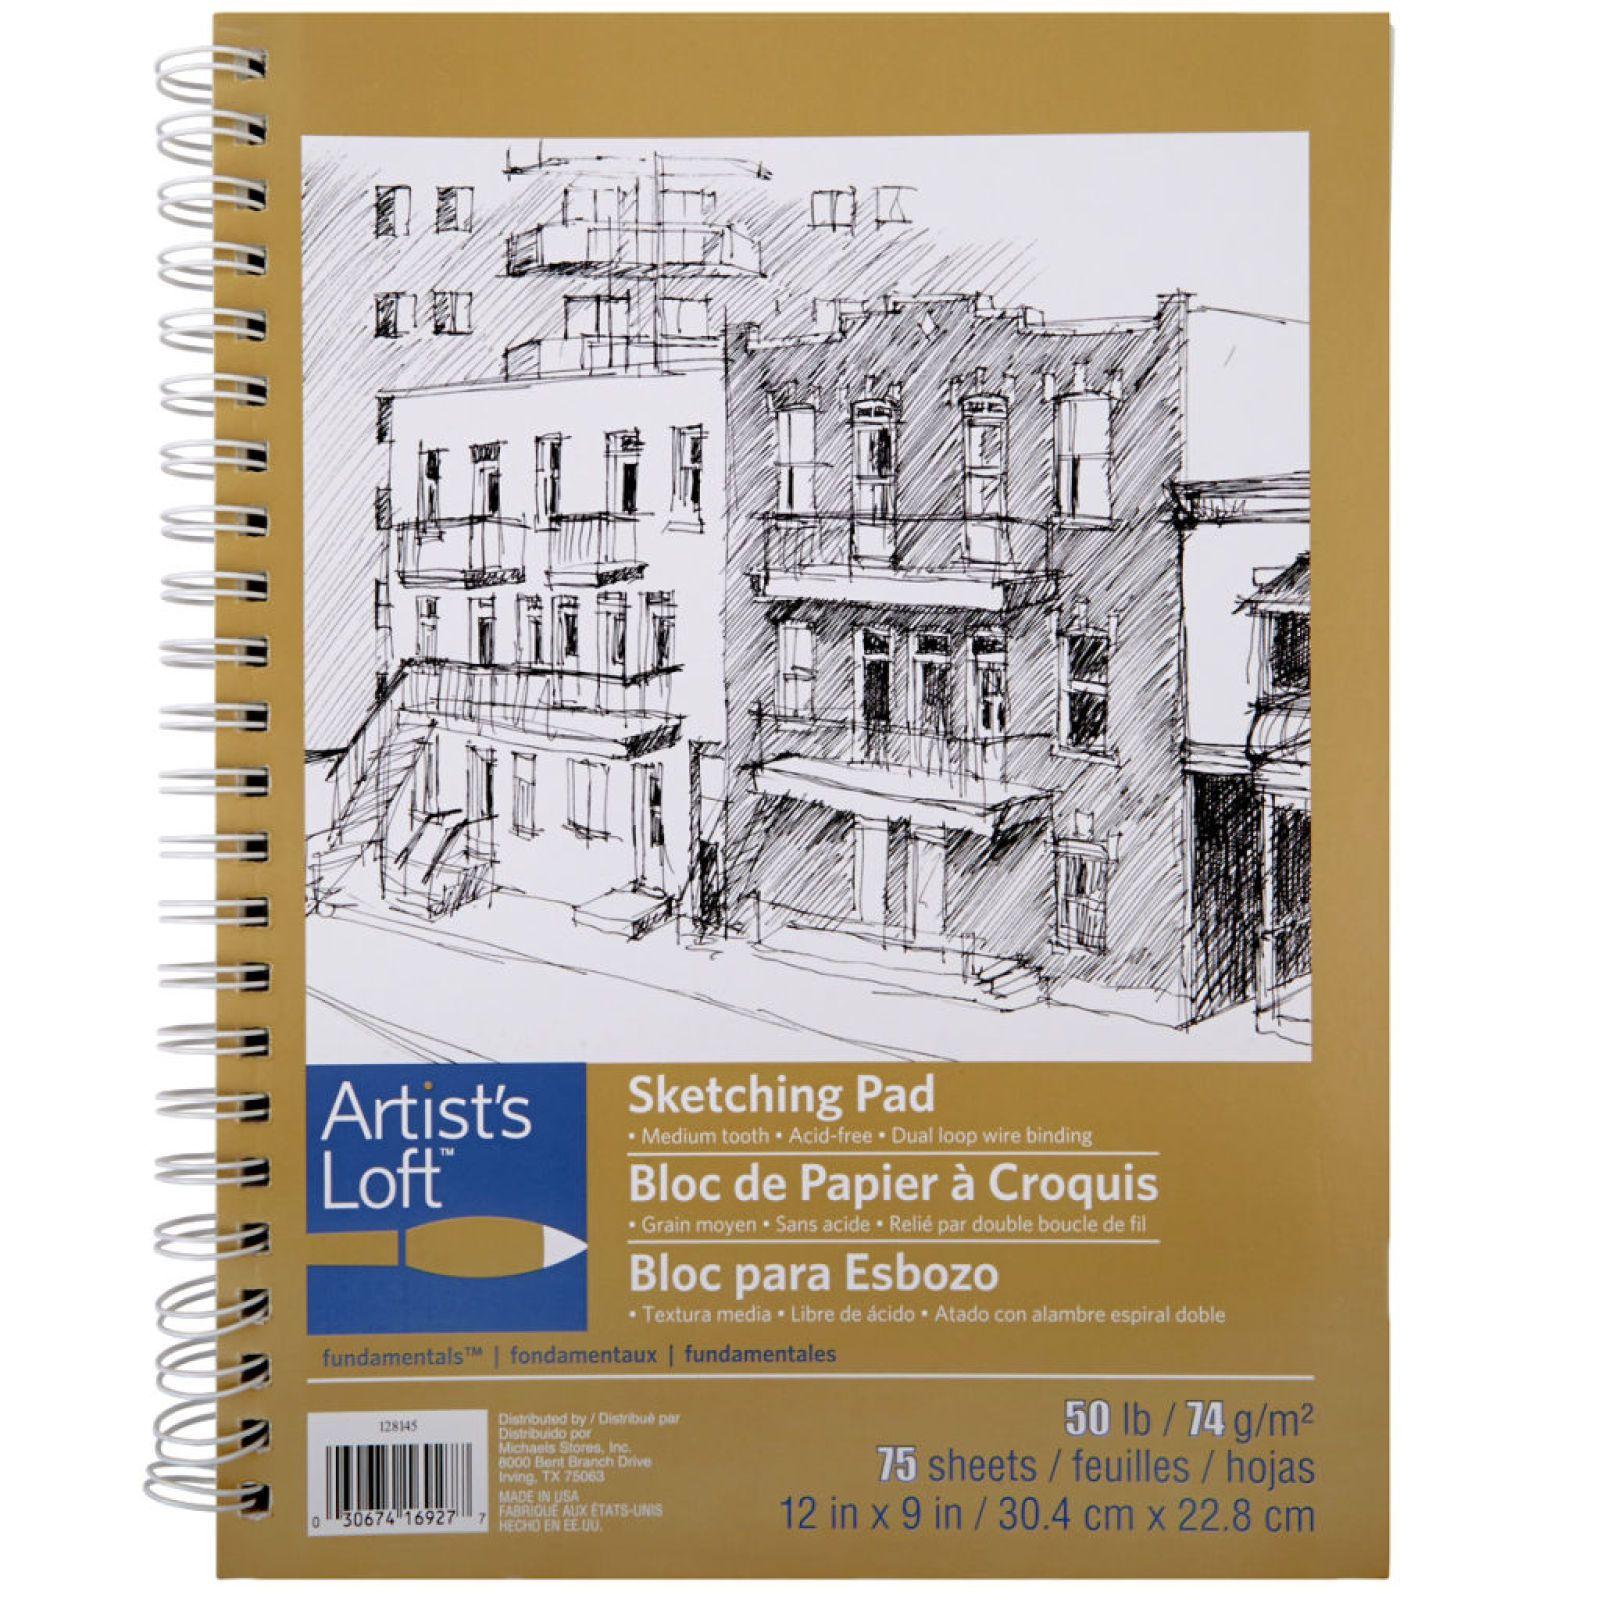 Artist s Loft™ Fundamentals Sketch Pad 9